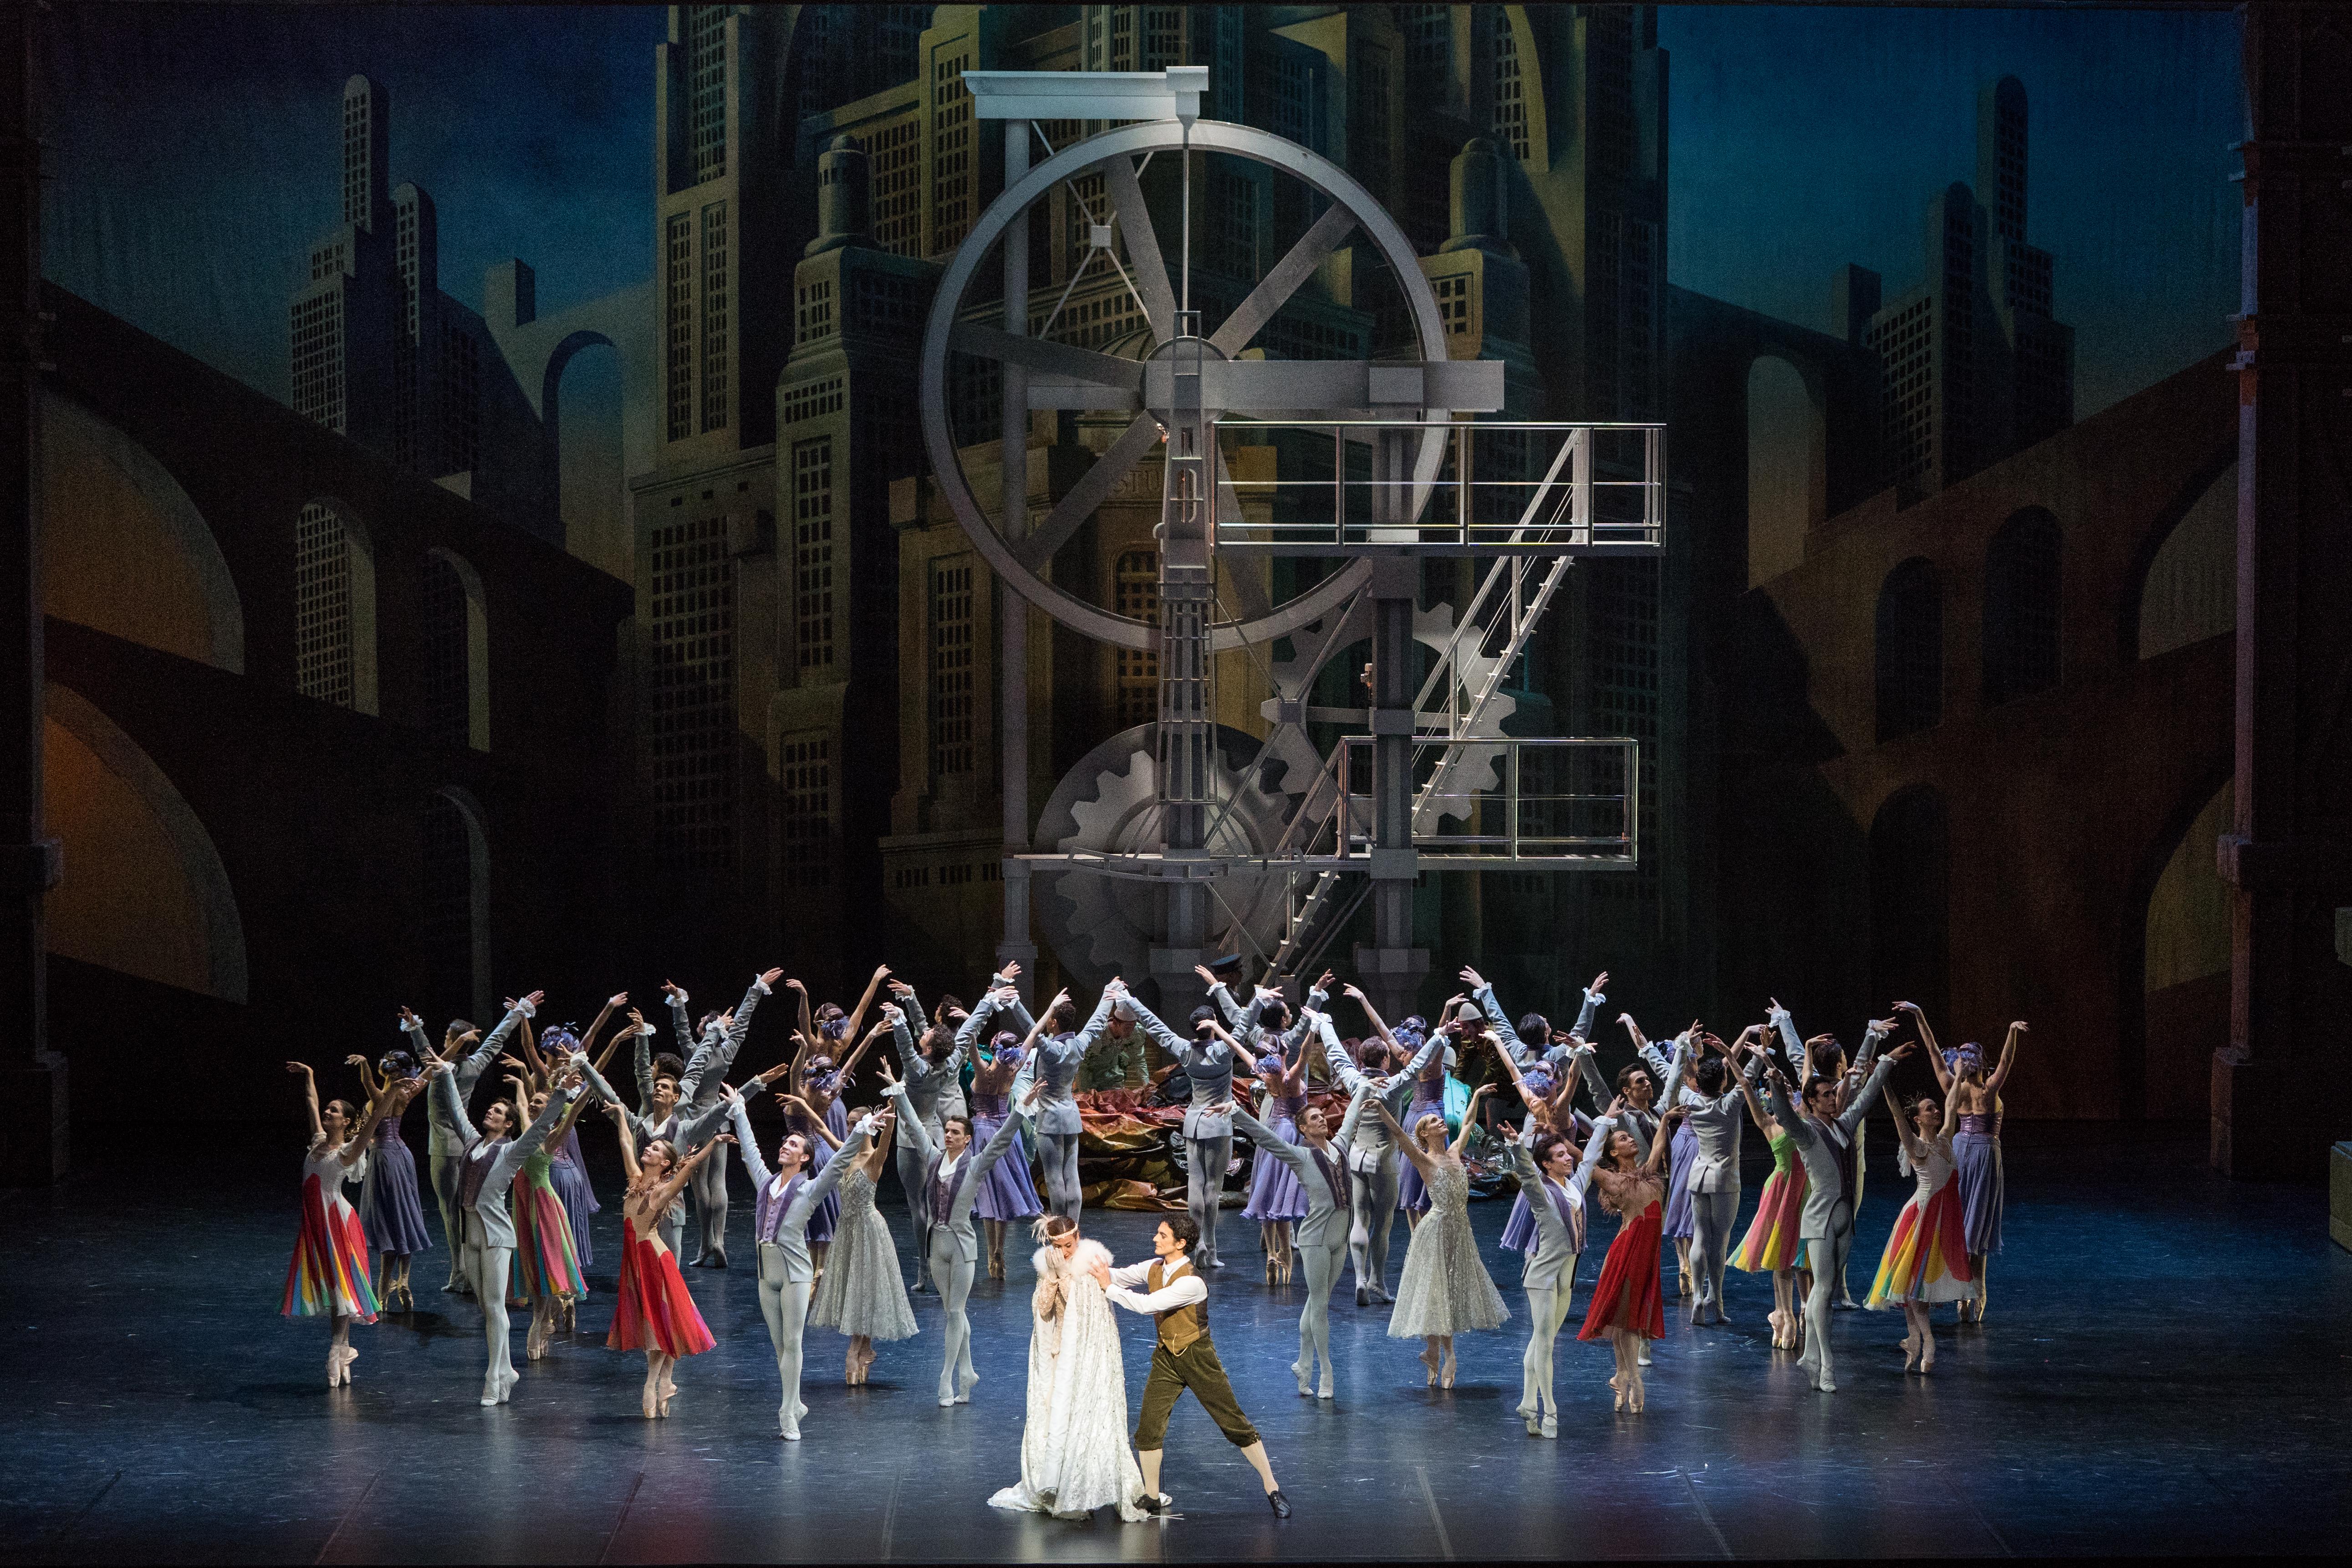 Photo copyright: Yonathan Kellerman/OnP. Nureyev's Cinderella performed by the Paris Opera Ballet.